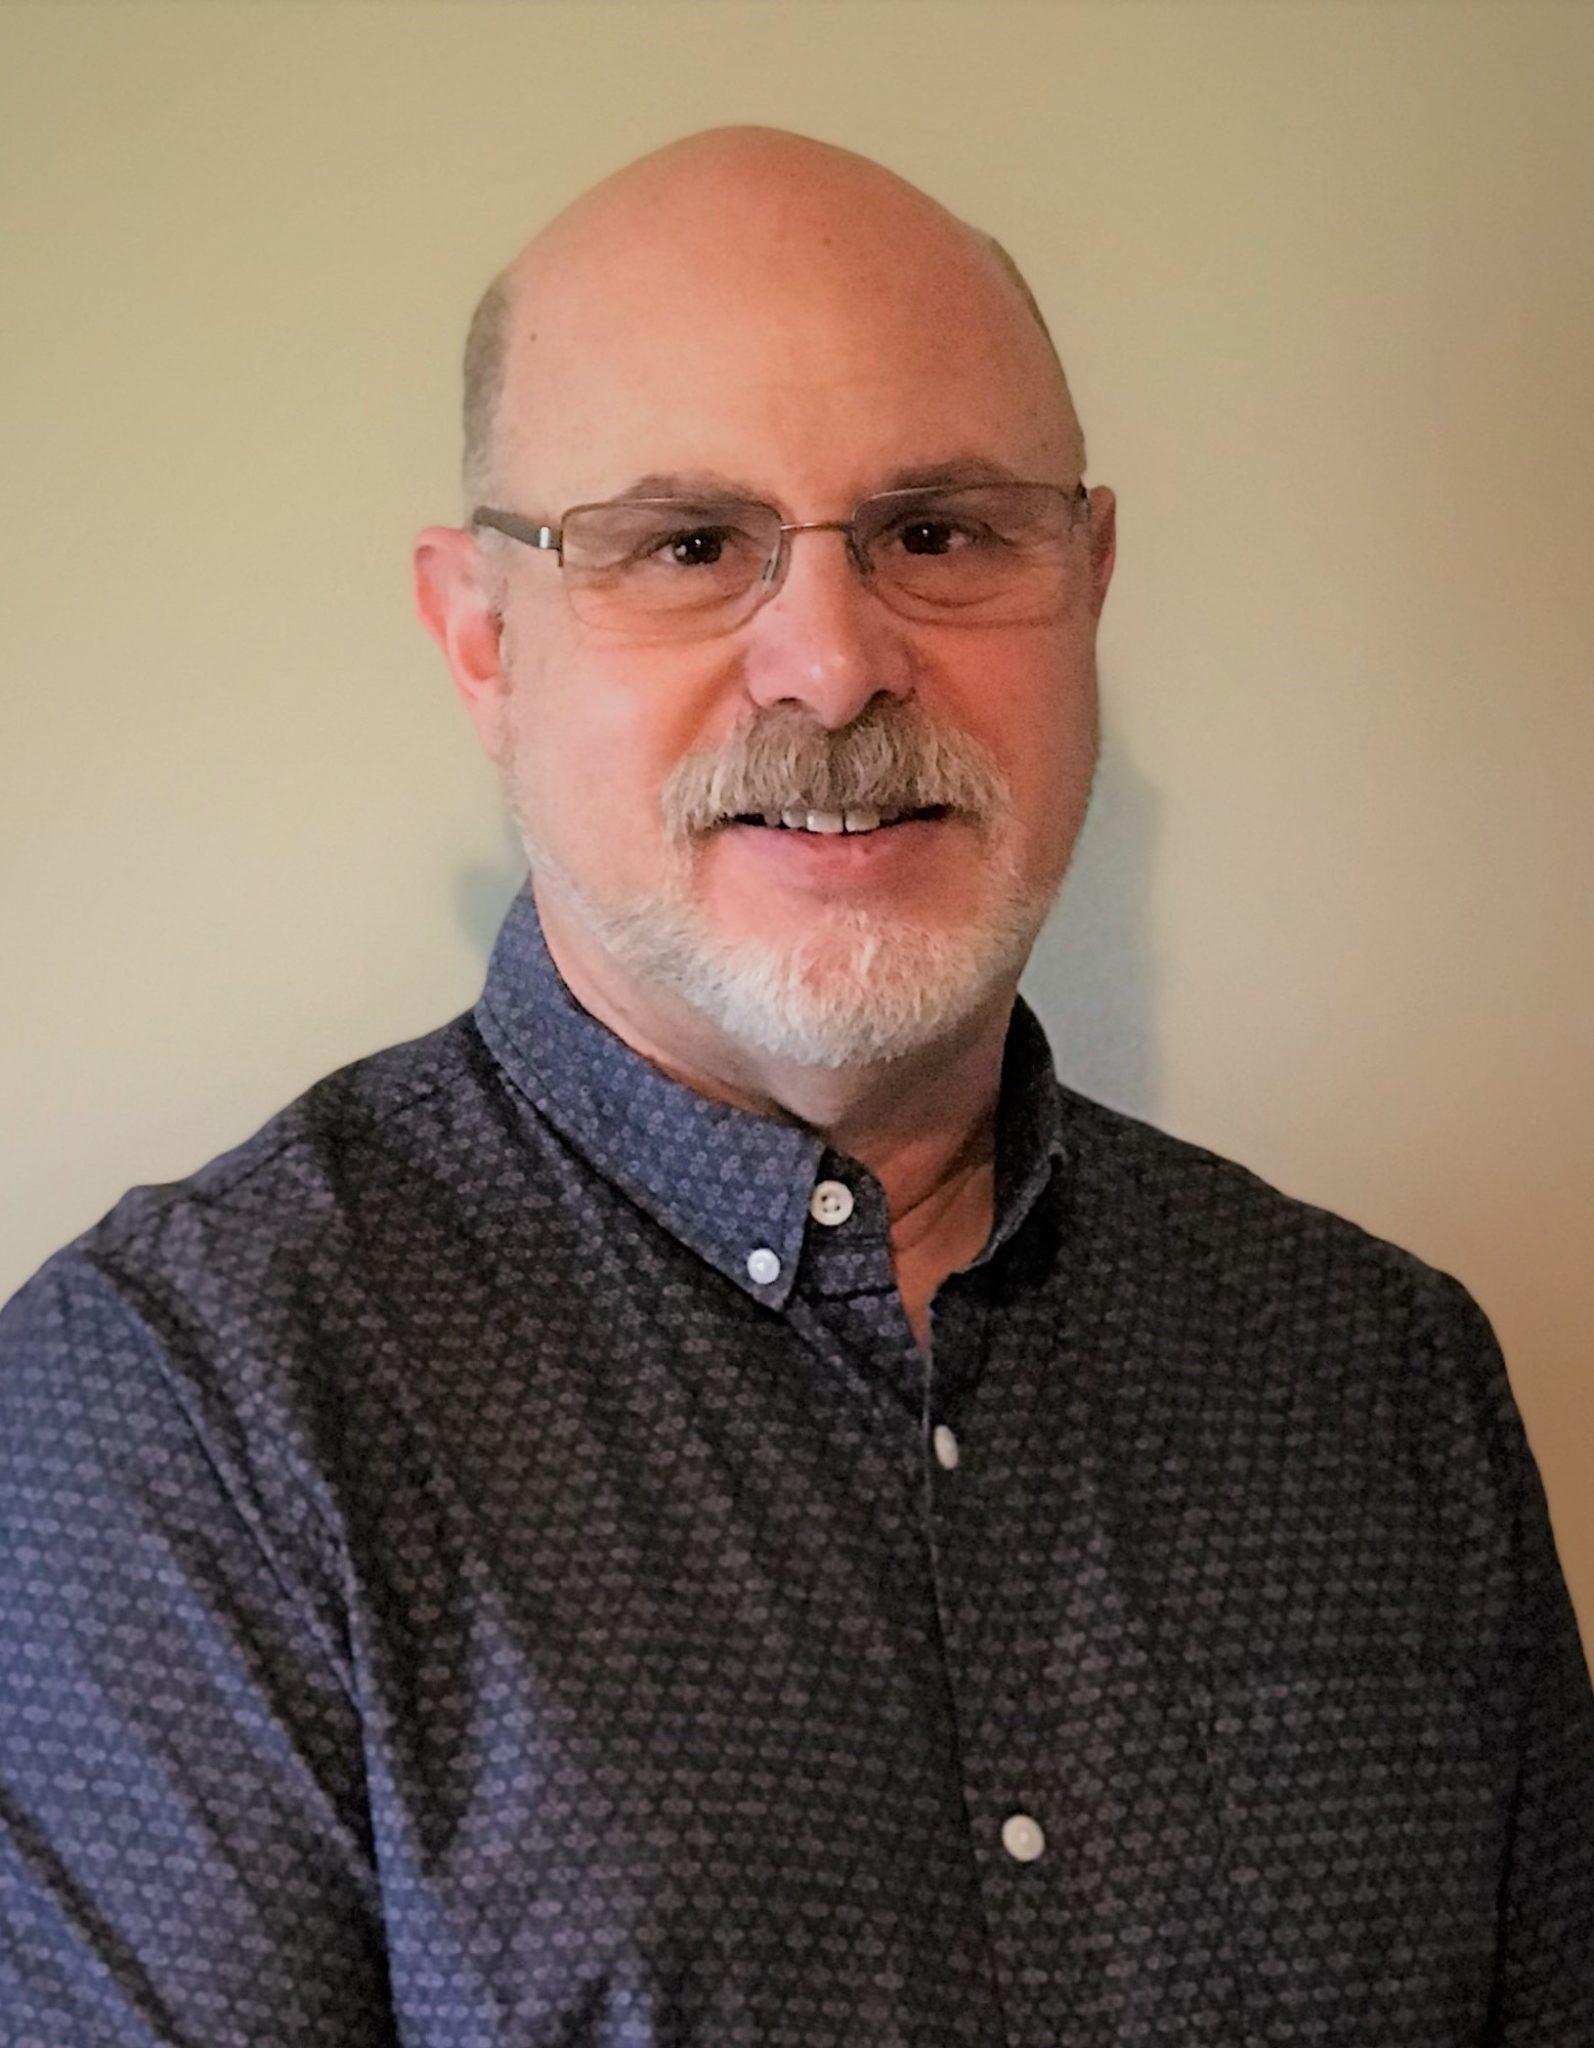 Rick Worlitz